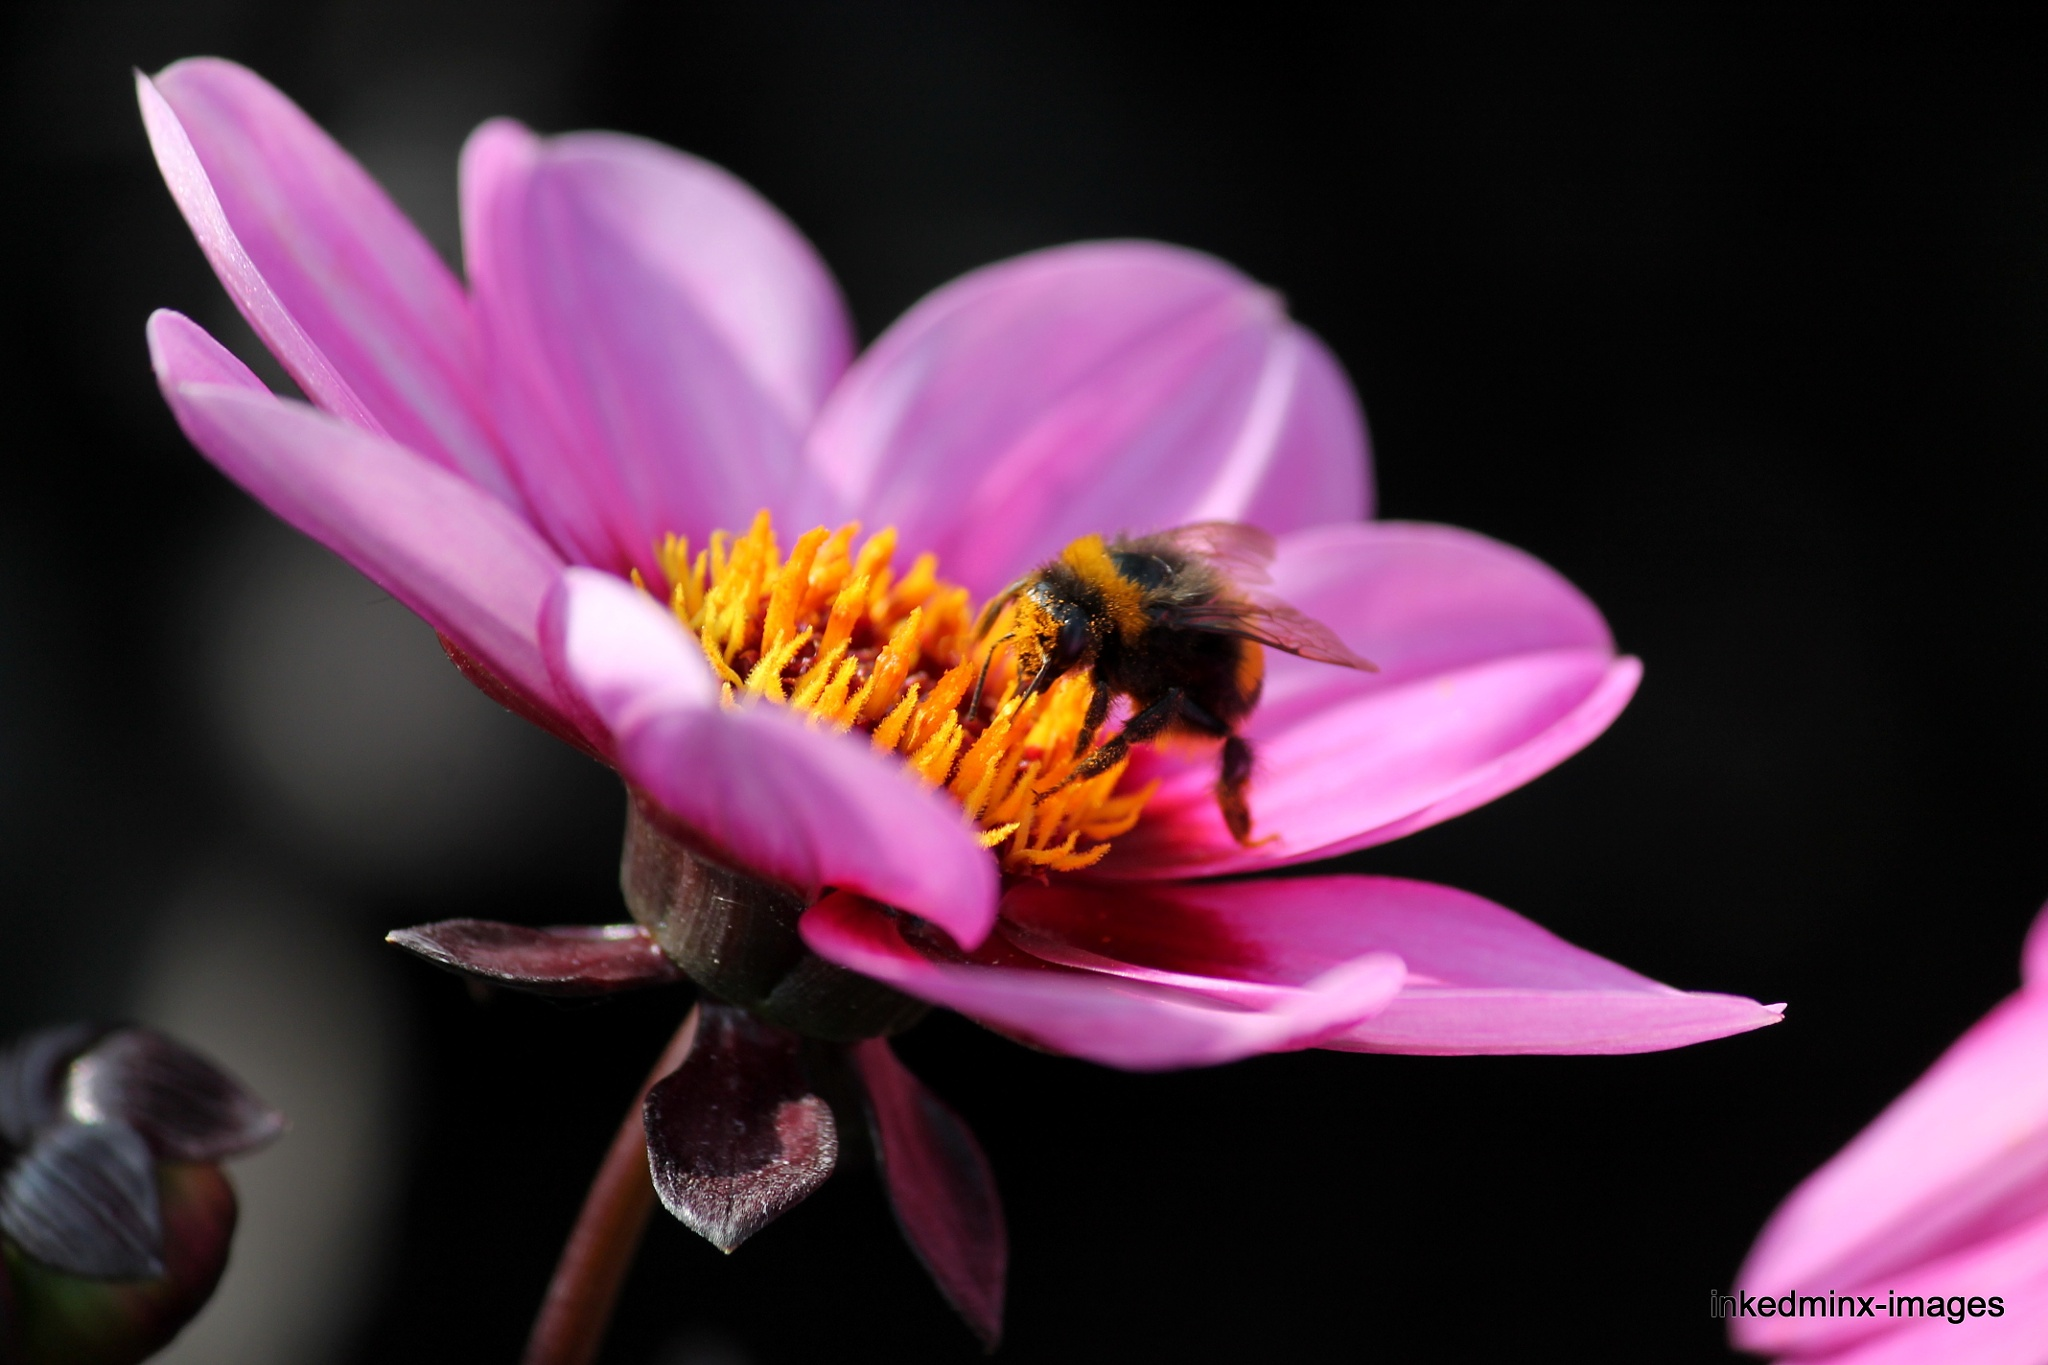 The Amber nectar by Miranda Inked-minx Watkins